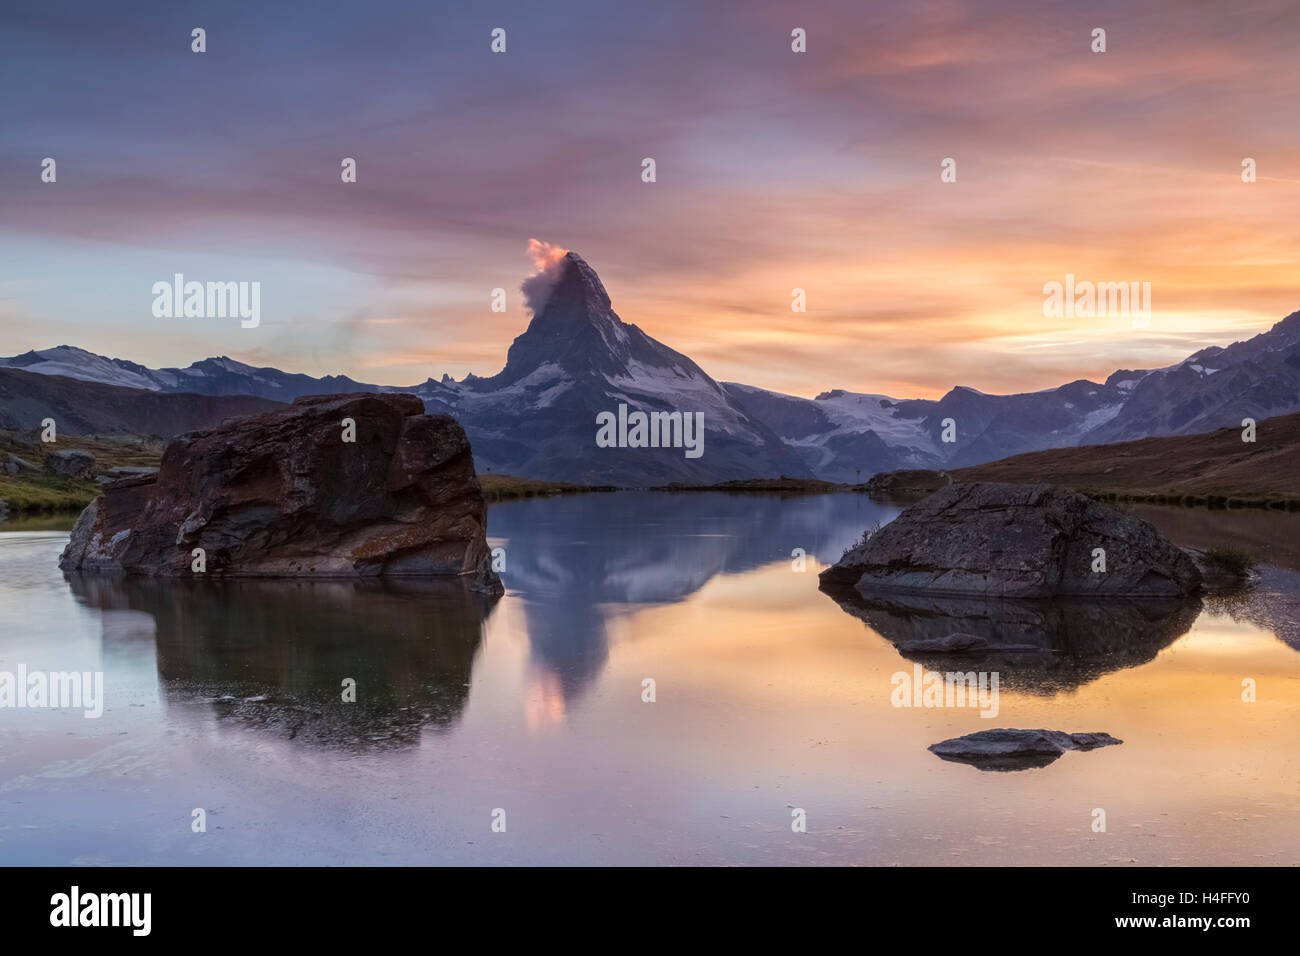 Matterhorn reflecting on the Stellisee Lake, Zermatt, Switzerland. - Stock Image